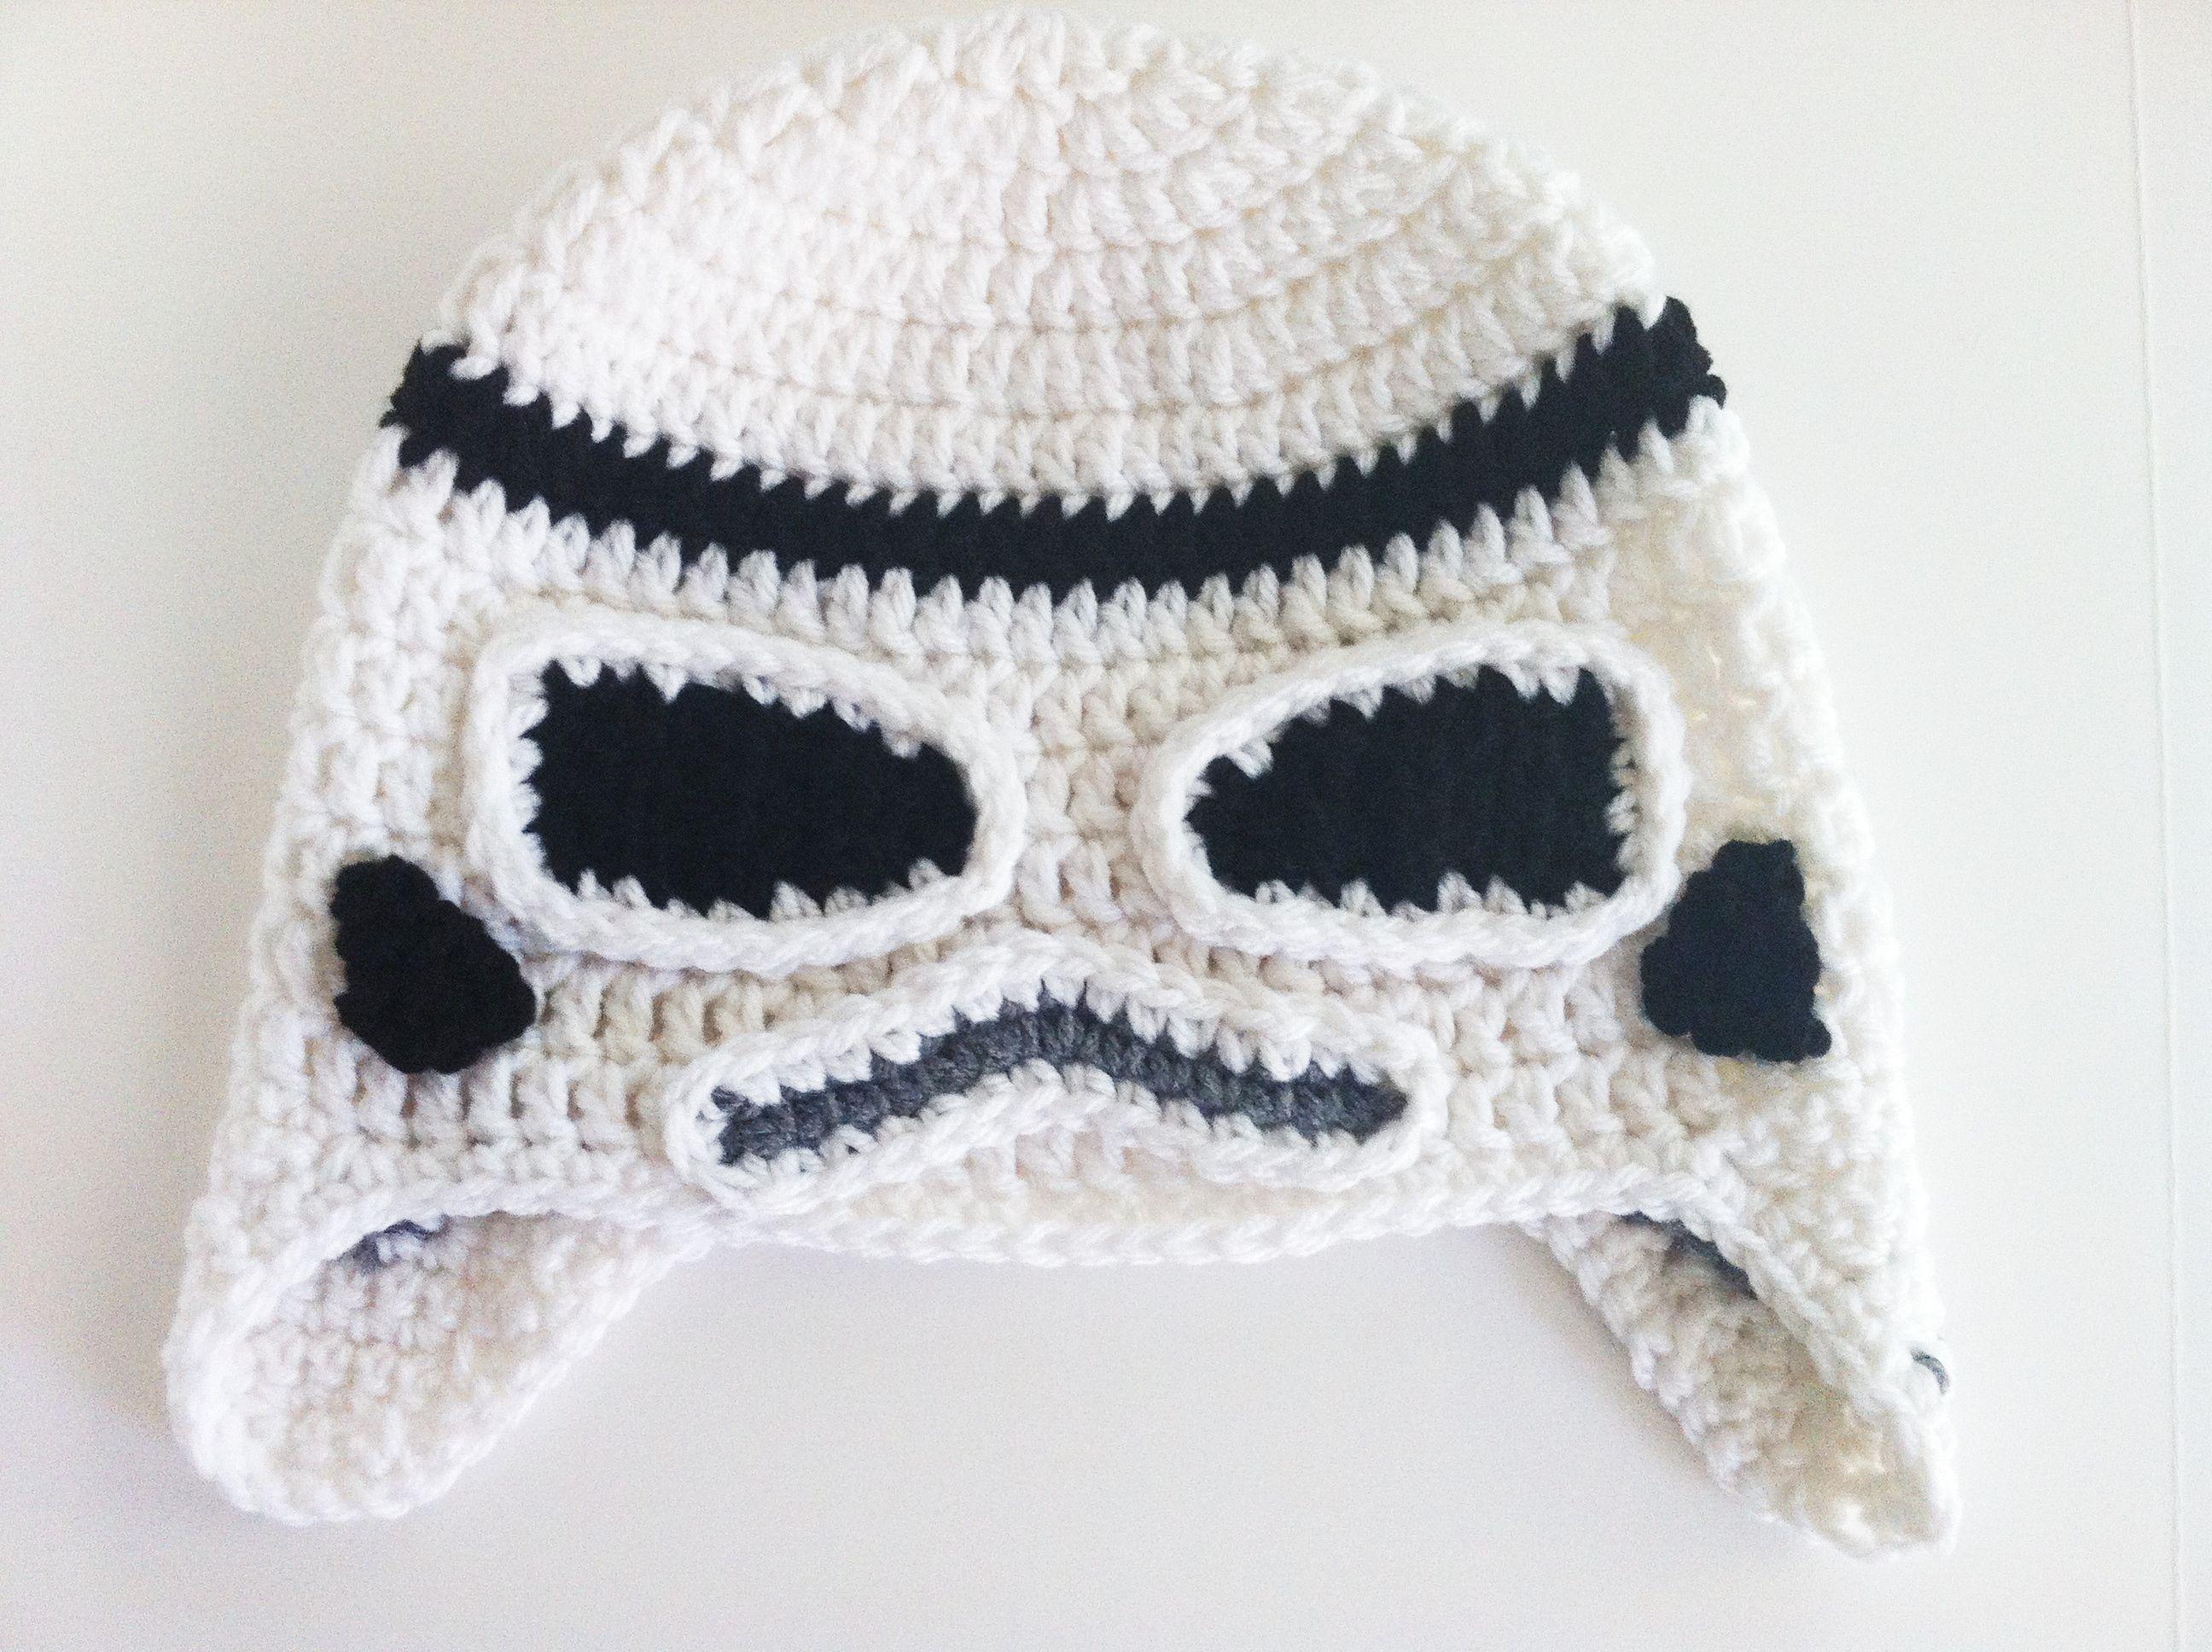 Star Wars Crochet Hats - Storm Trooper. NO PATTERN. Need for ...